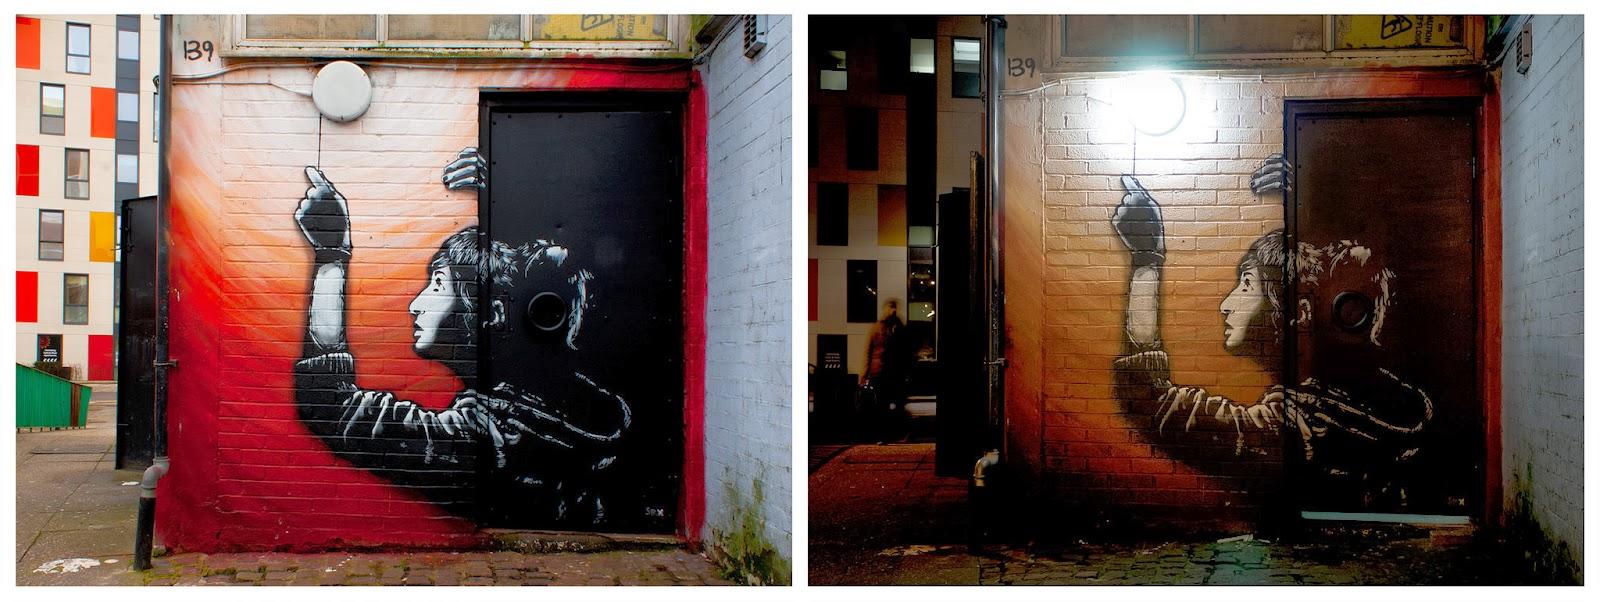 Great New Street Art Stencil By Spanish Urban Artist Sr X on the streets of London